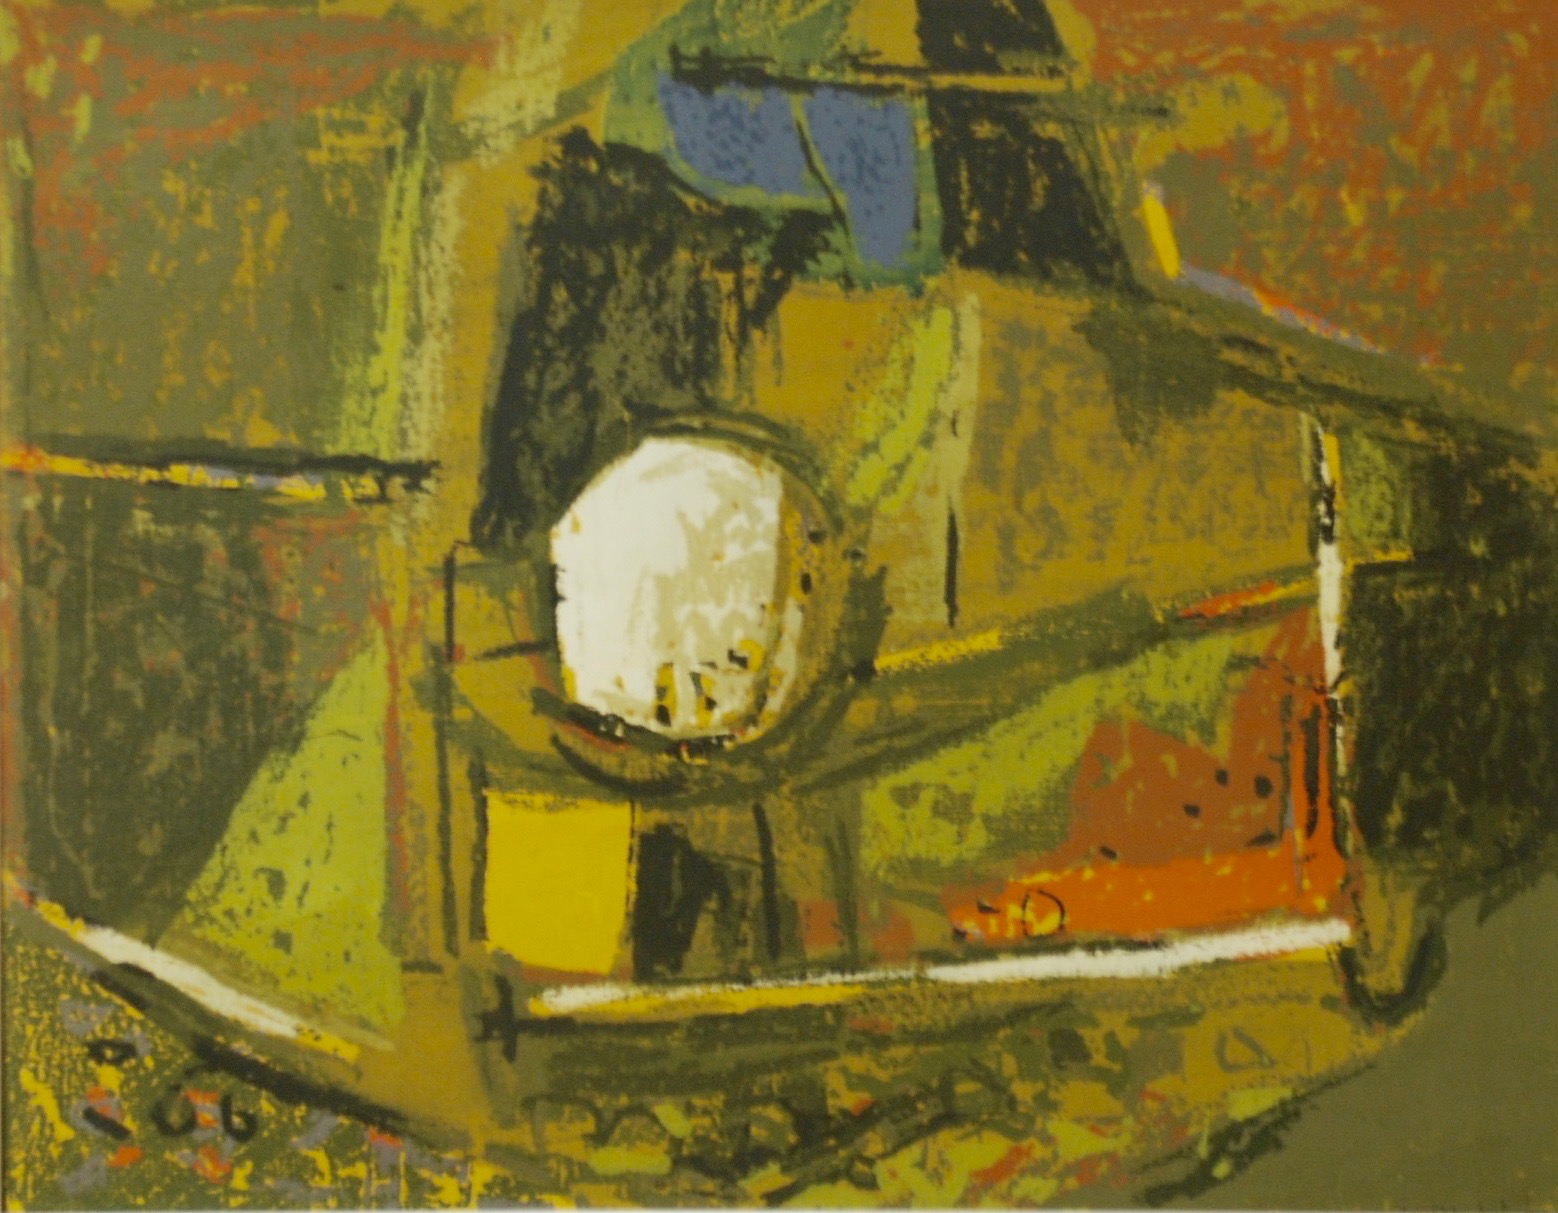 Gordon Applebe Smith, Untitled